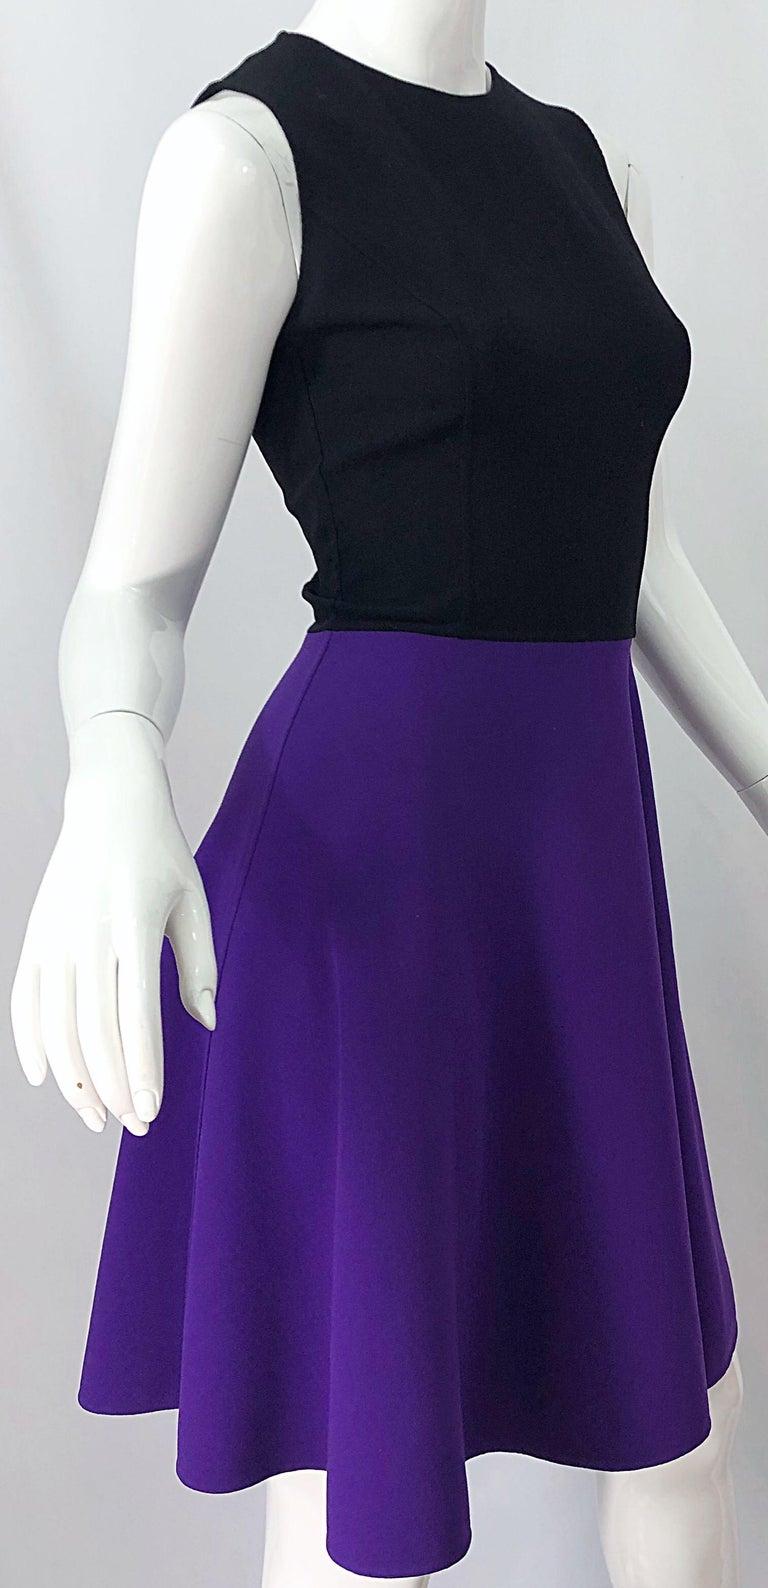 Michael Kors Collection Size 2 / 4 Purple + Black Color Block Sleeveles Dress For Sale 4